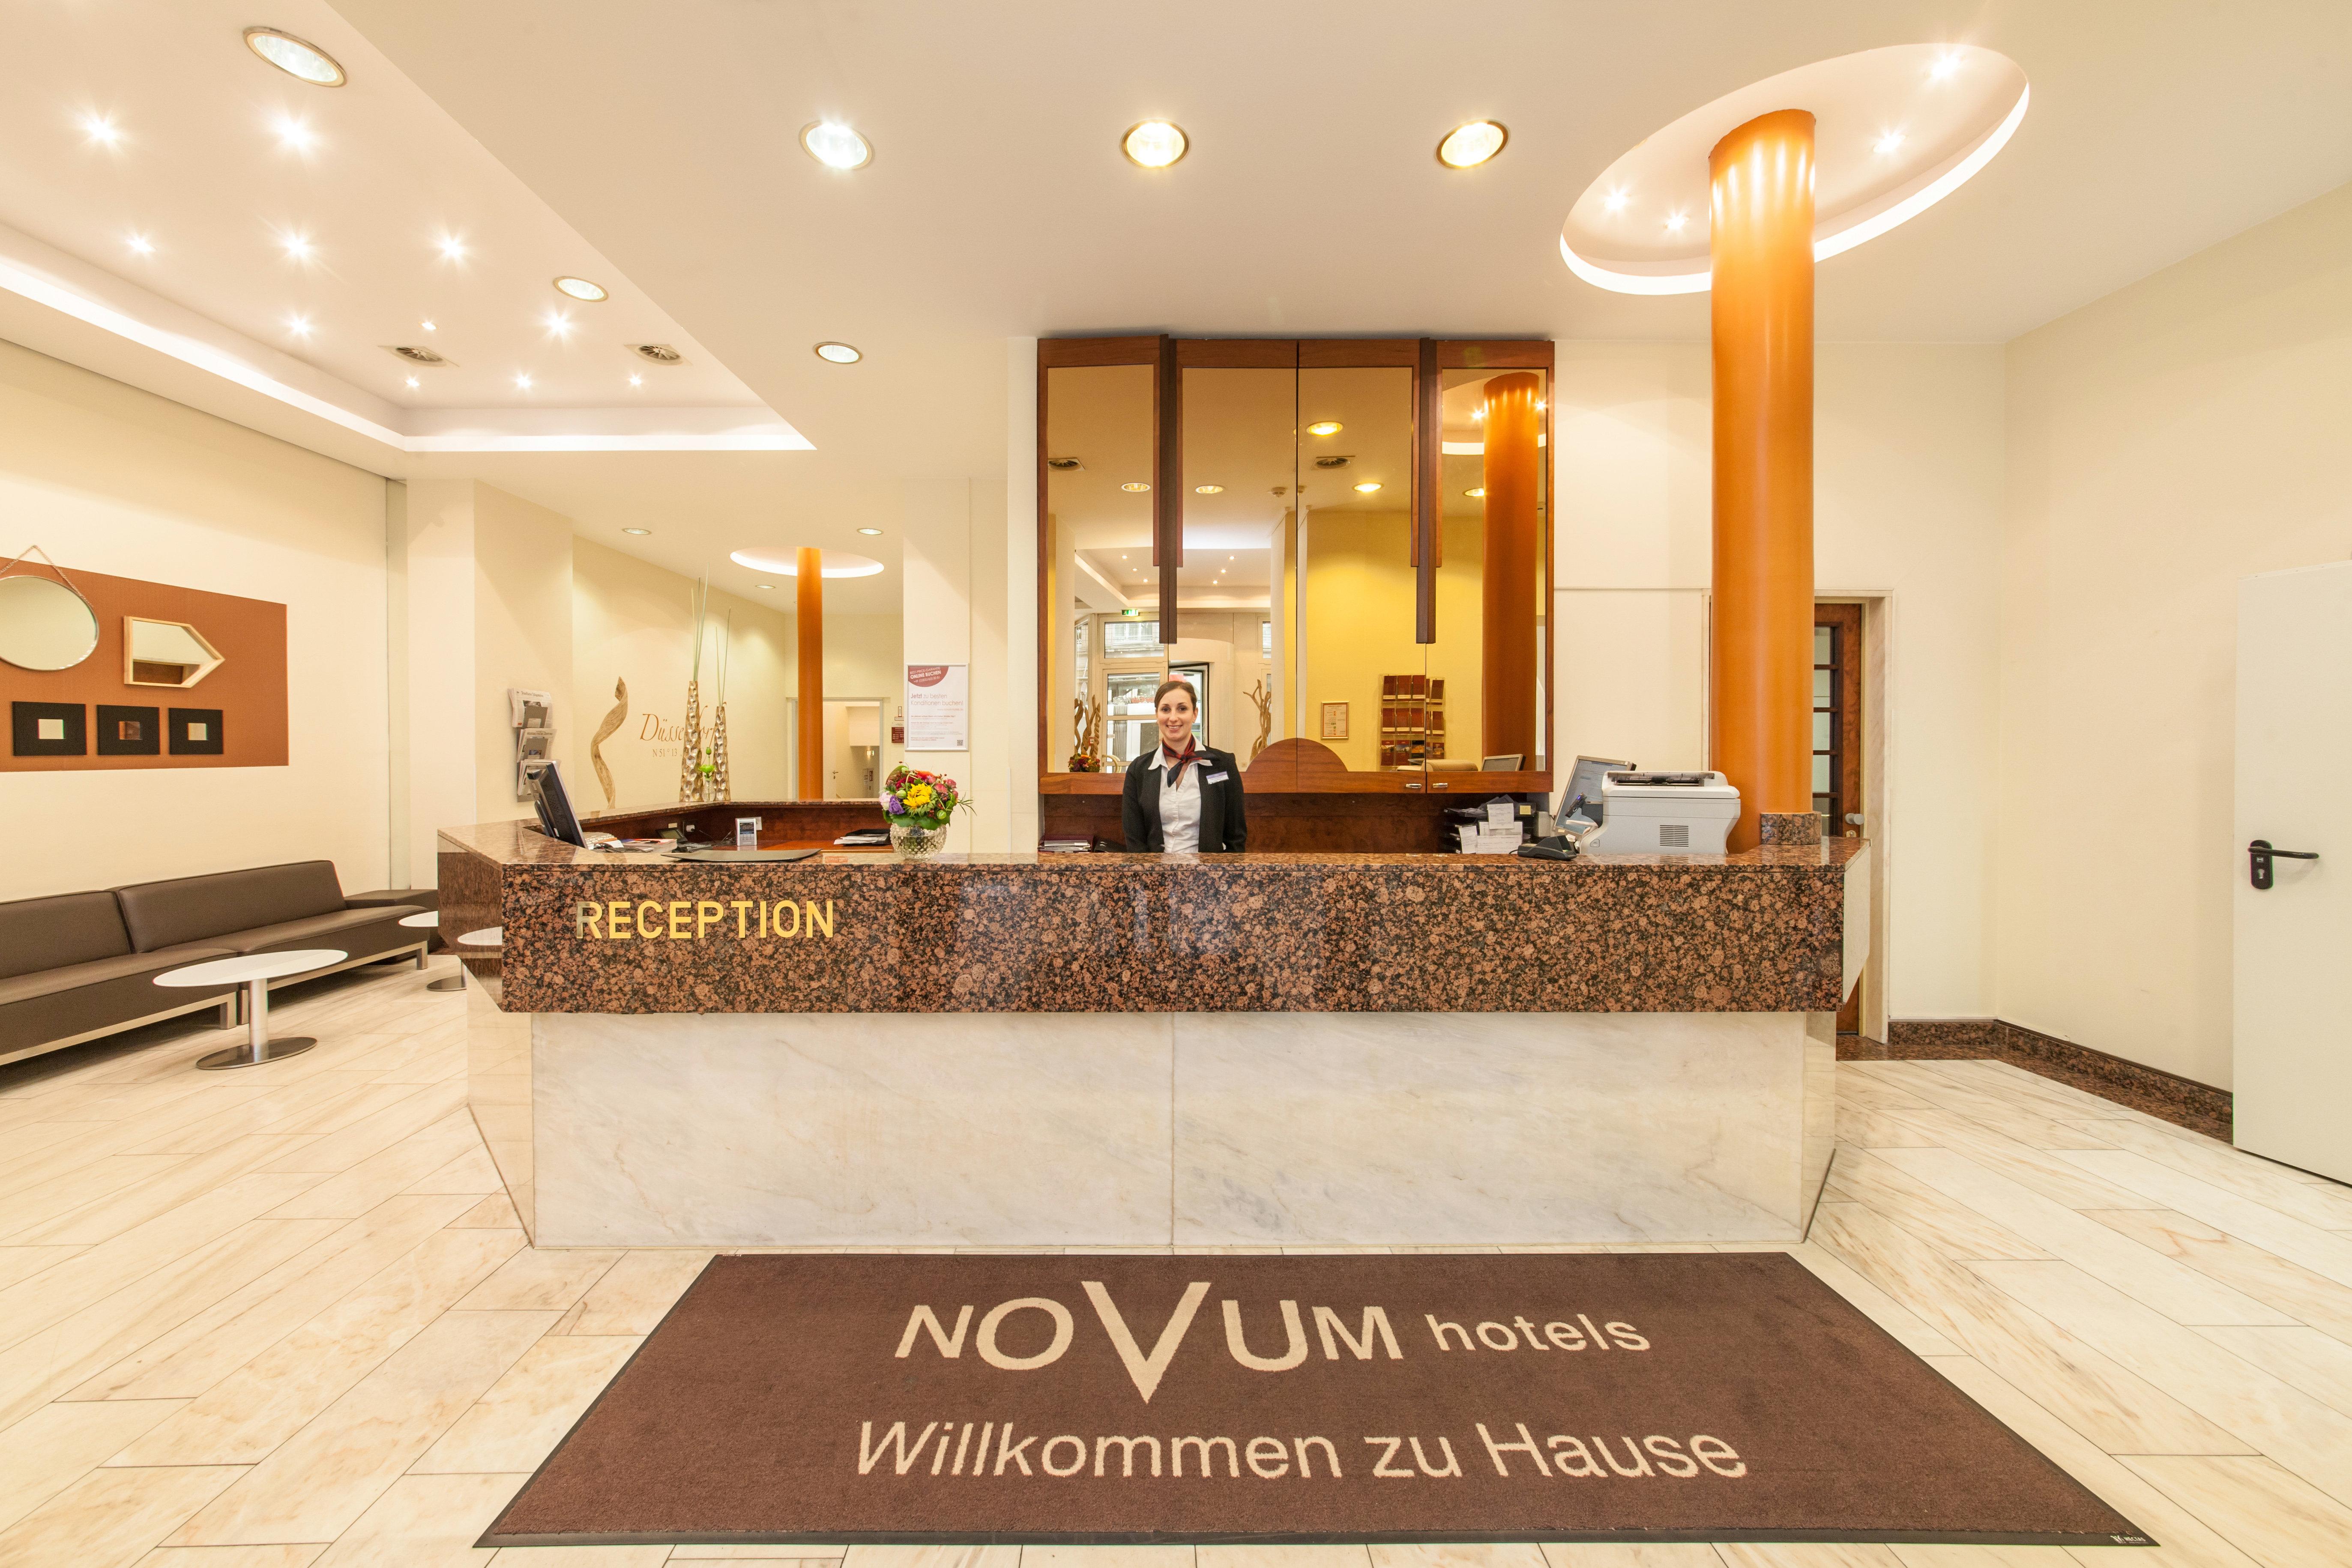 Novum Suites Hotel Hamburg